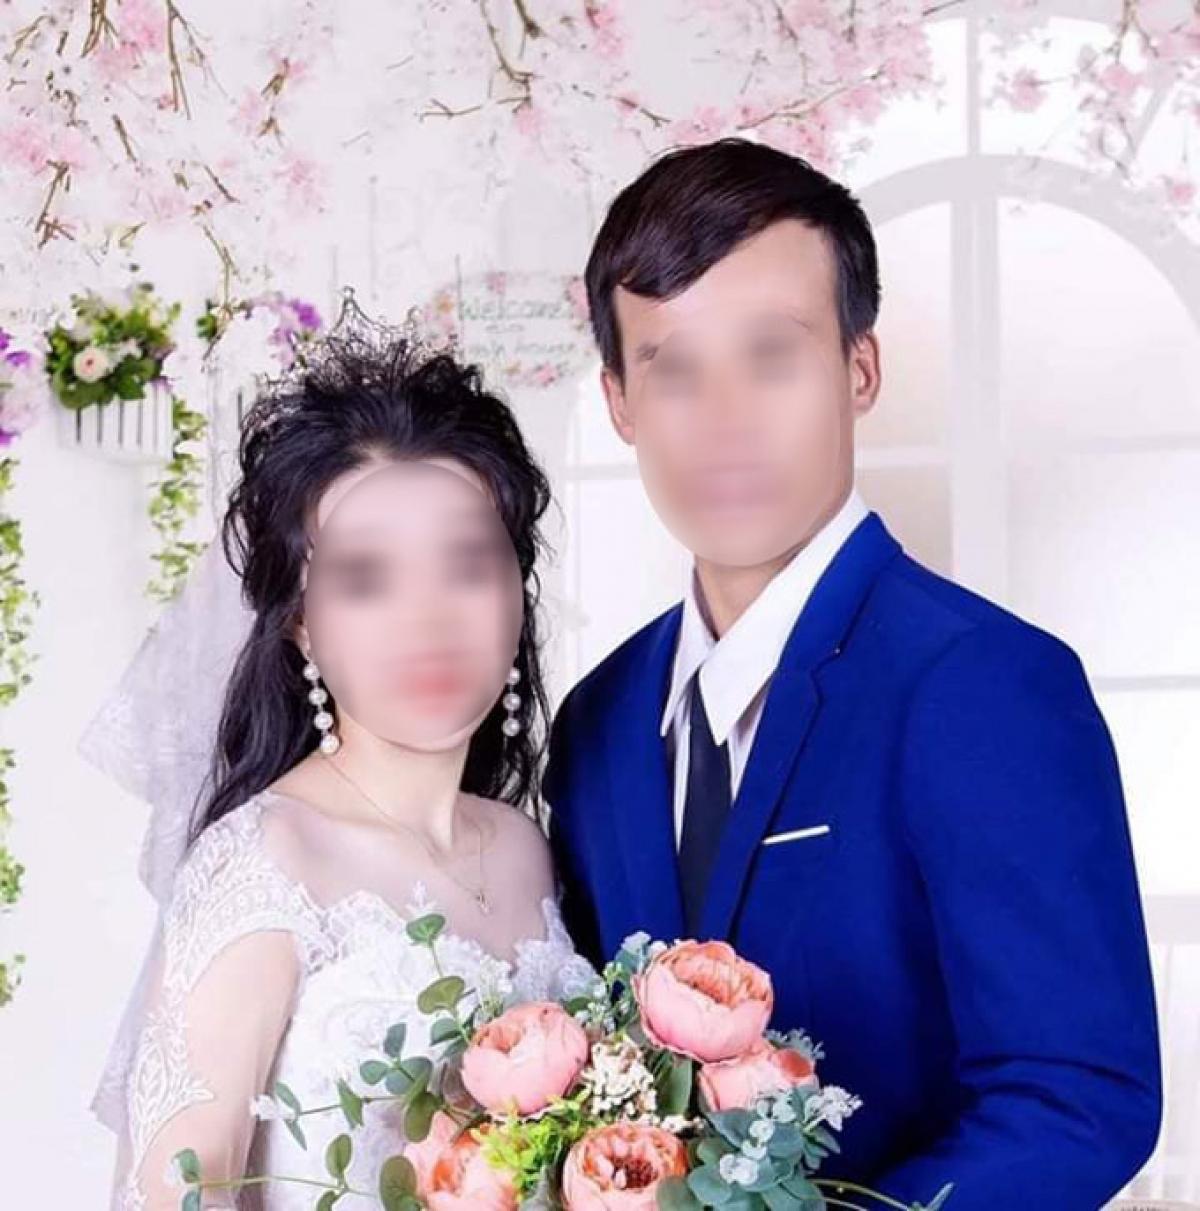 co-dau-bo-di-voi-2-luong-vang-1588896803683558237080.jpg